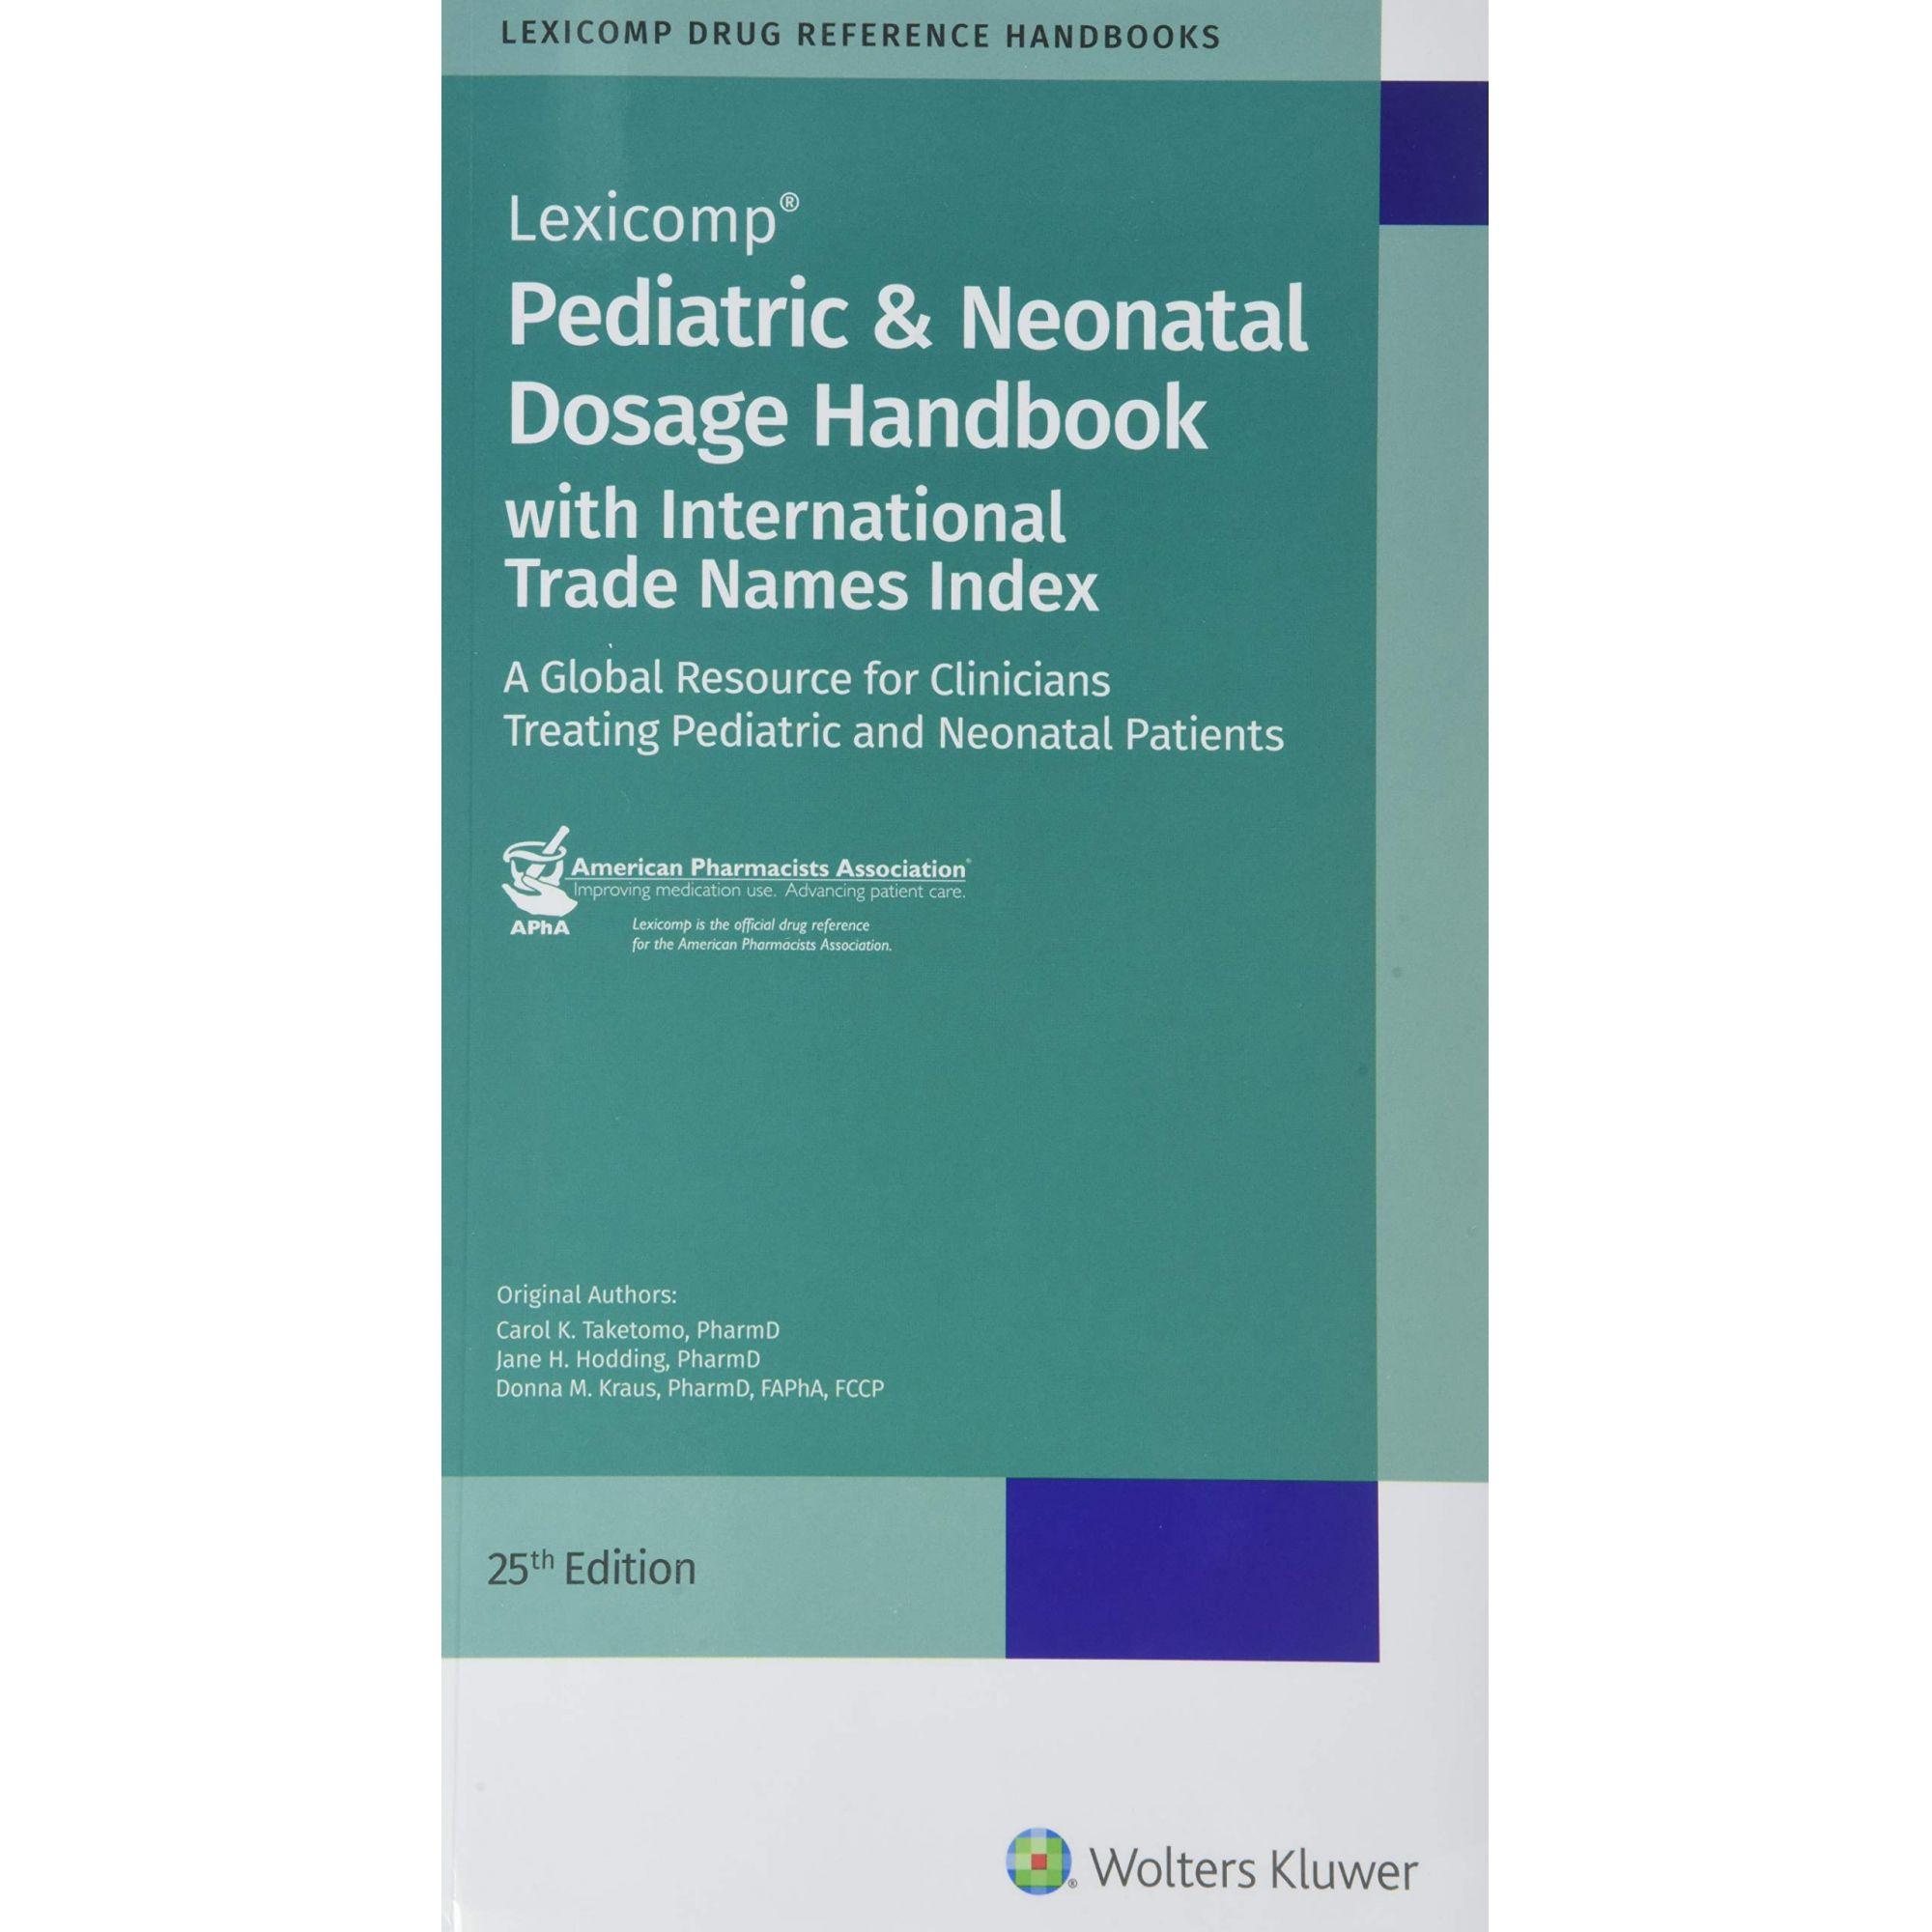 Pediatric Neonatal Dosage Handbook With Trade Names Index